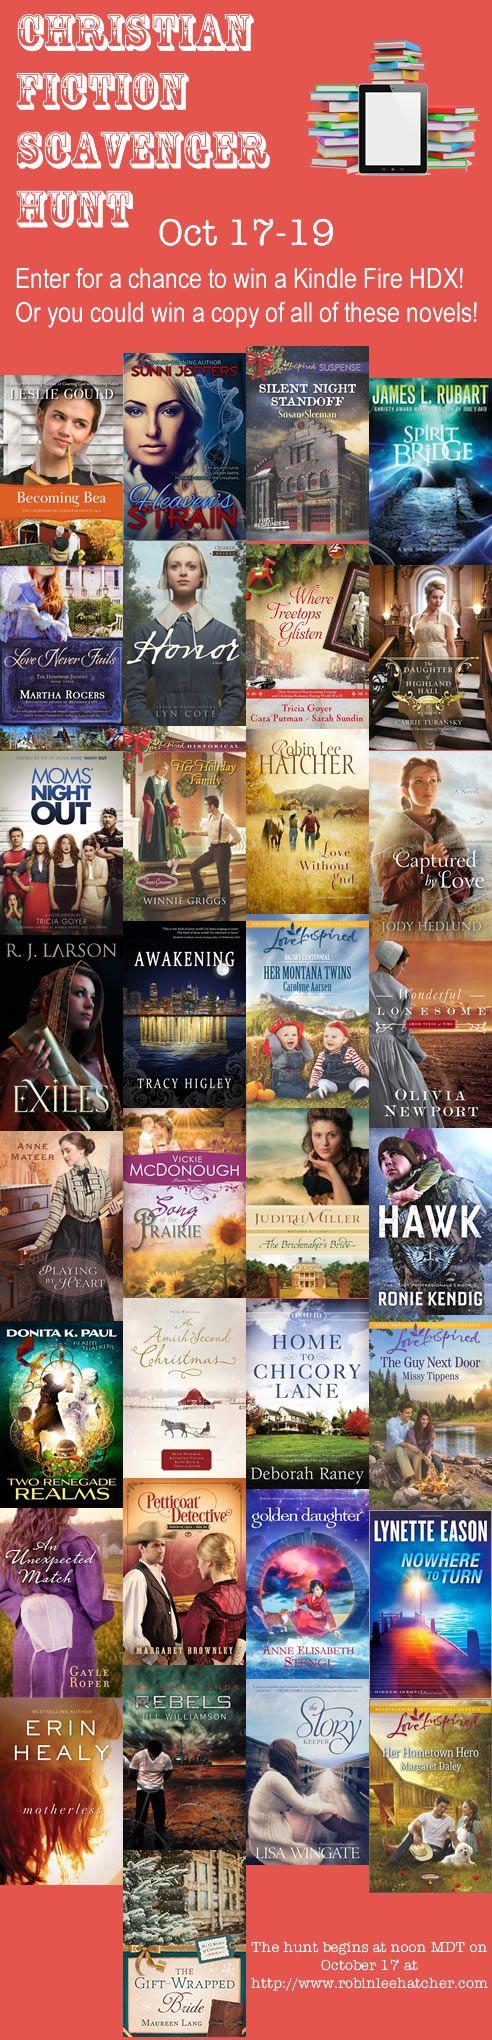 Christian Fiction Scavenger Hunt - Win a Kindle Fire!